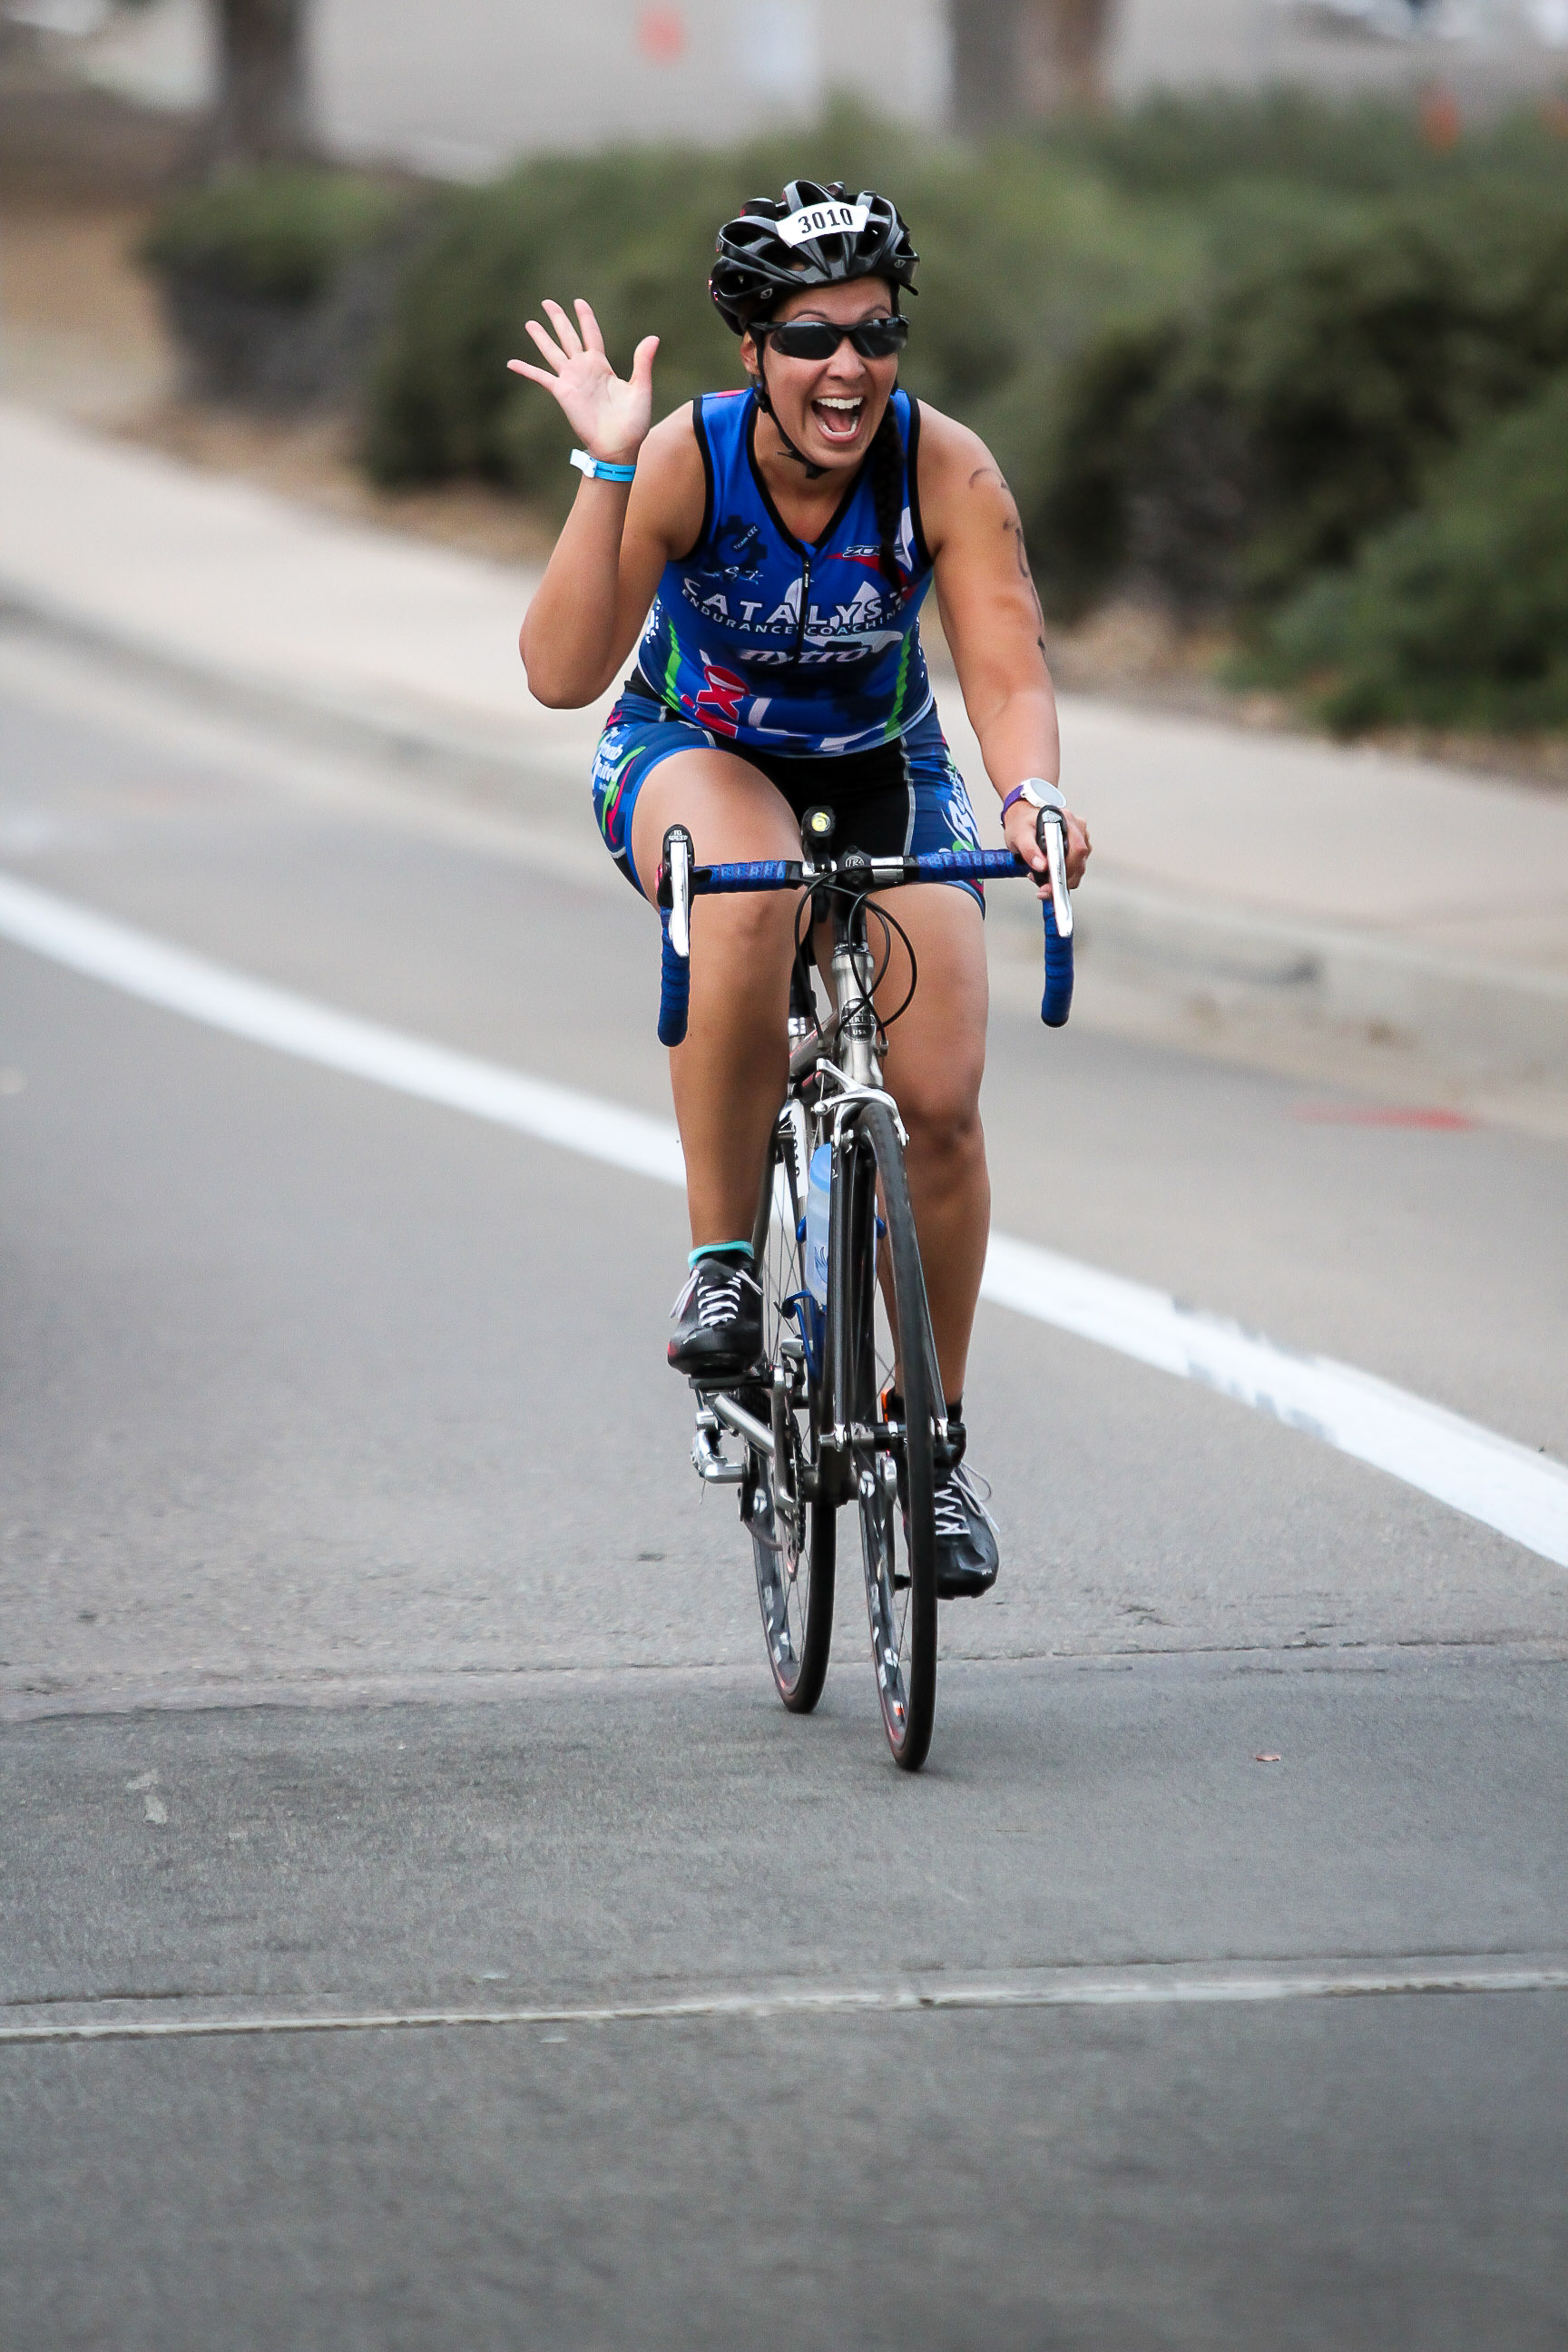 2018 XTERRA WETSUITS Mission Bay Triathlon, Duathlon